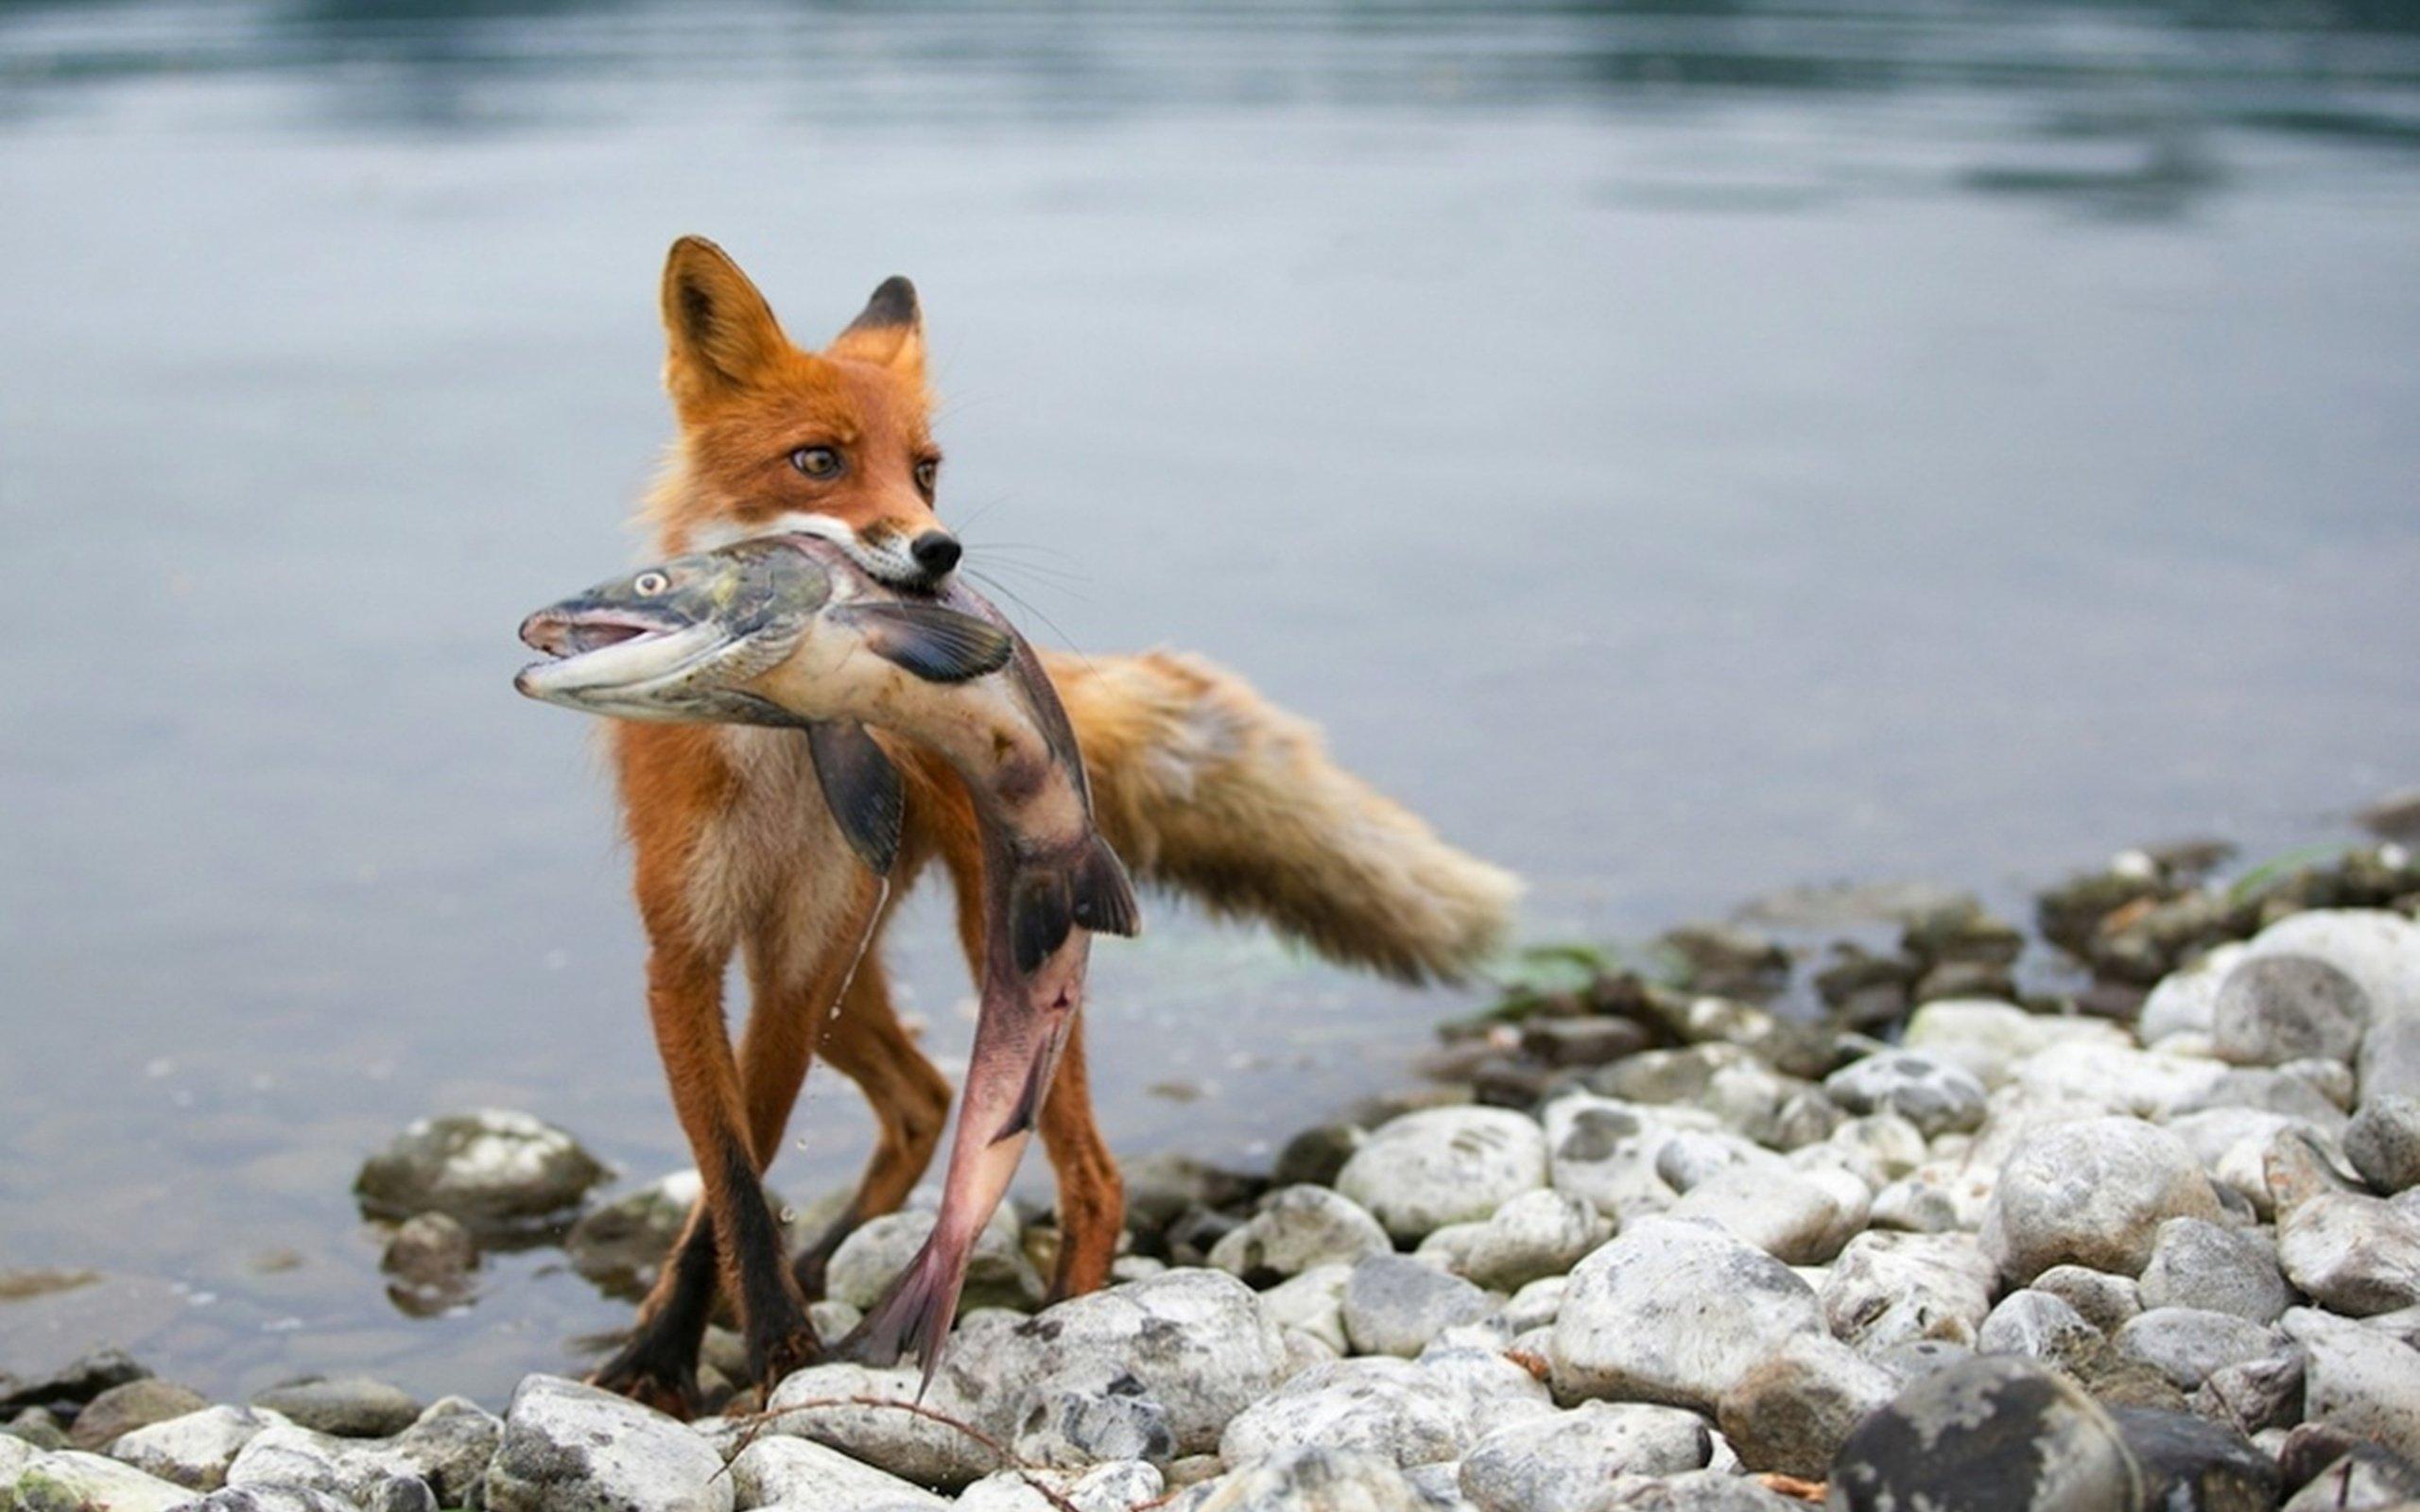 Hunting fishing fox wallpaper 2560x1600 505715 WallpaperUP 2560x1600